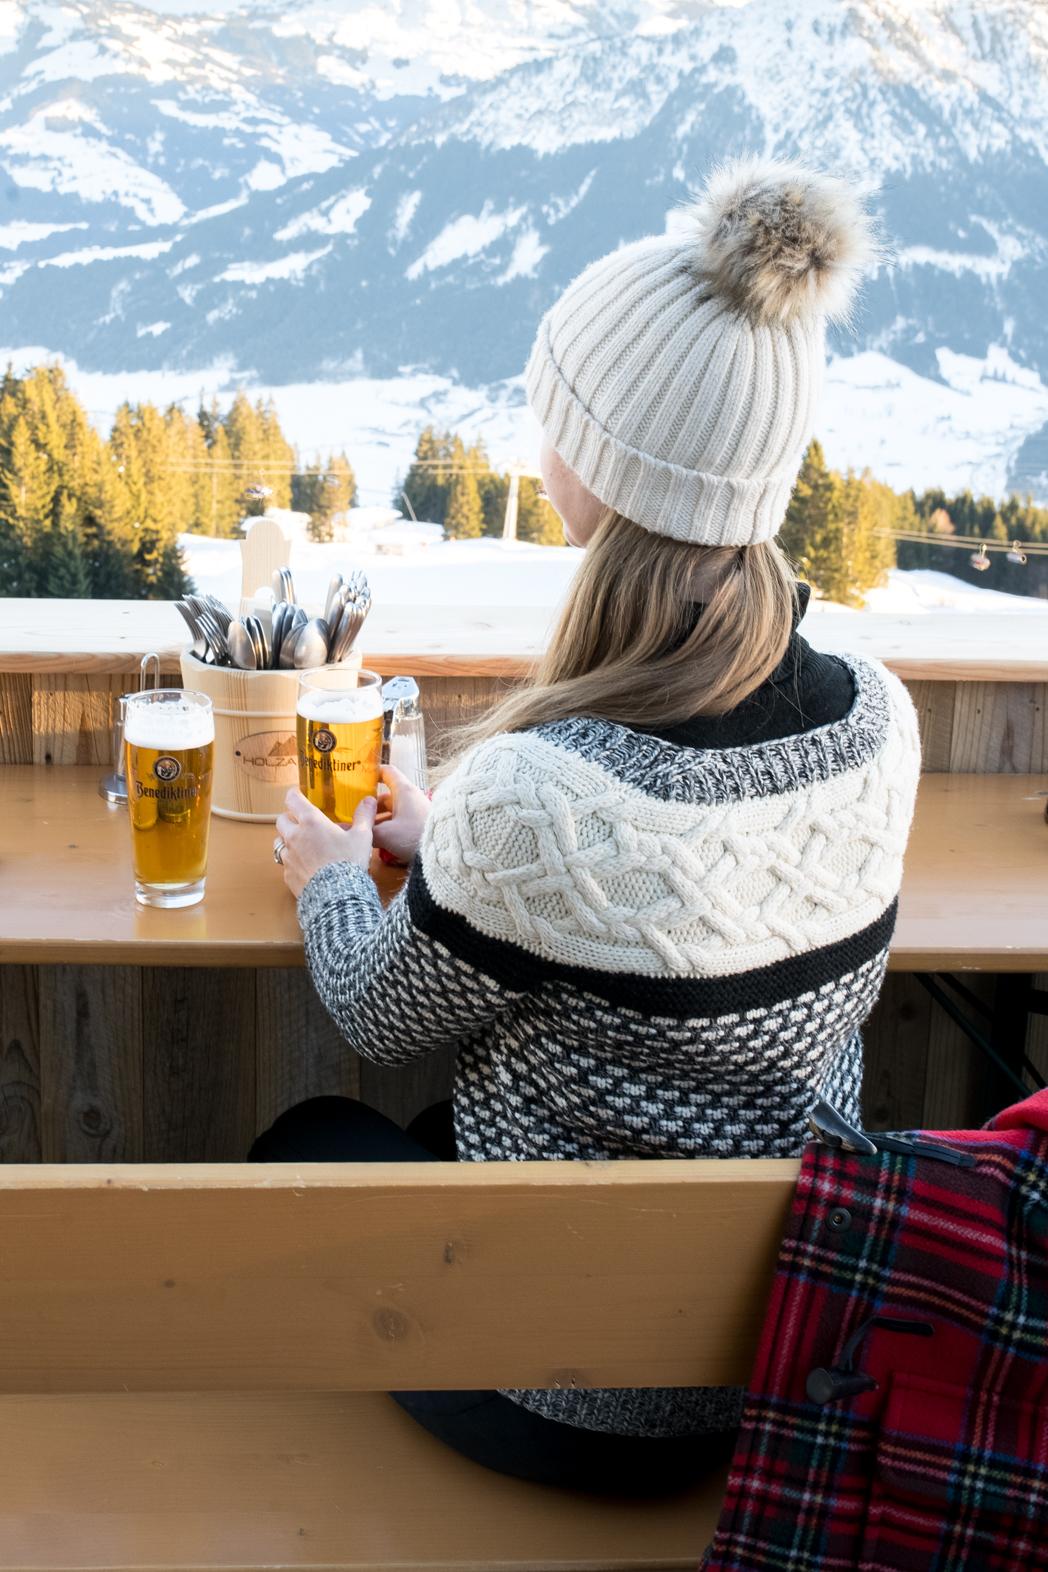 Stacie Flinner Christmas Ski Kitzbuhel Austria -10.jpg